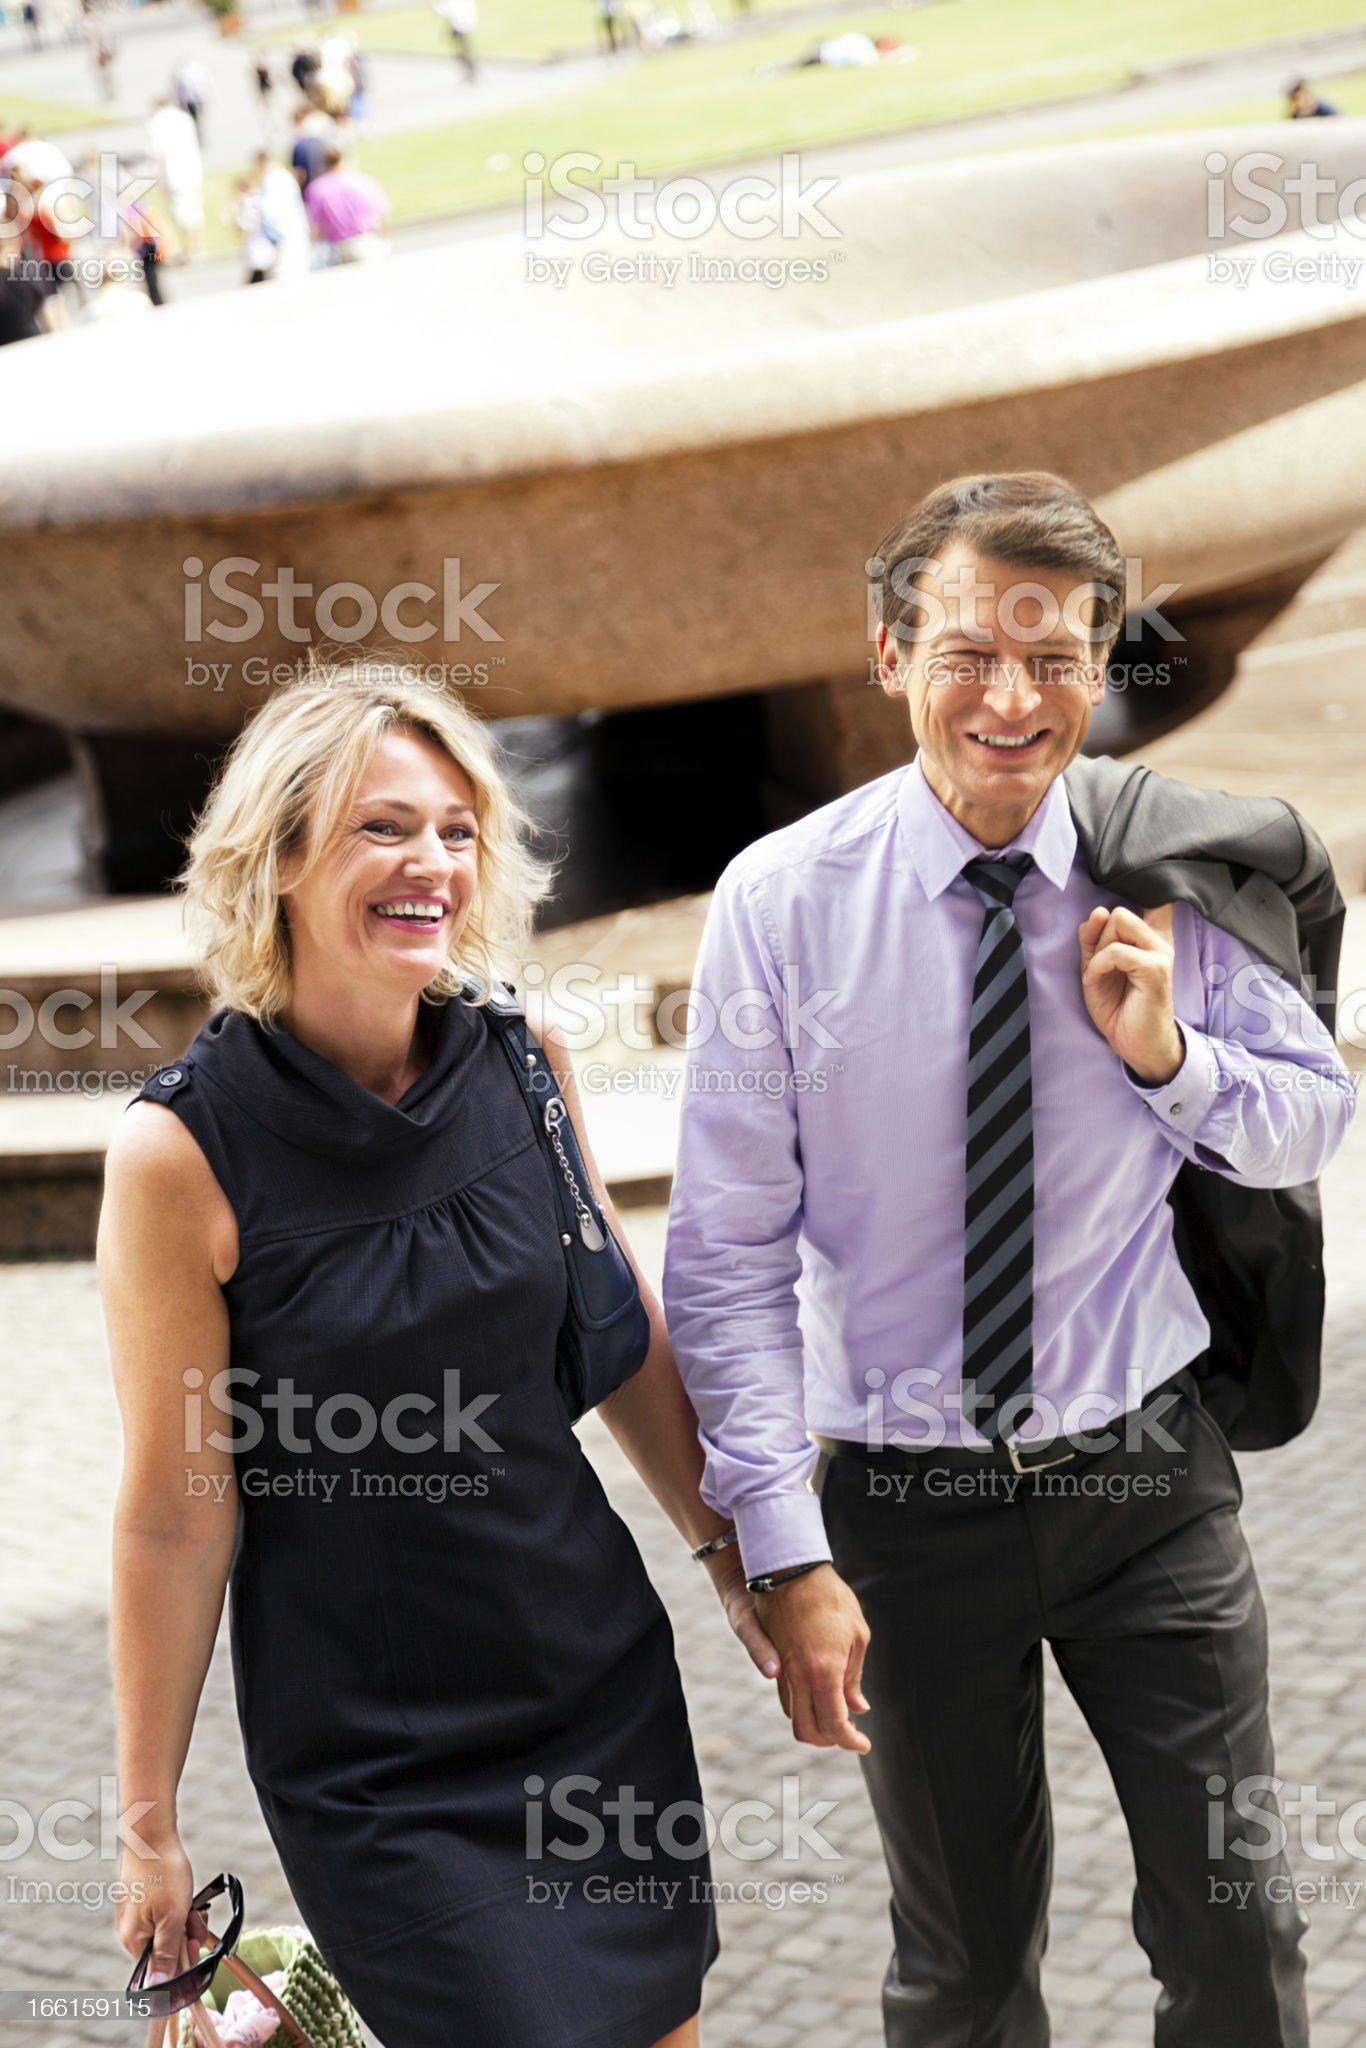 Mature Couple Walking in Urban Setting royalty-free stock photo